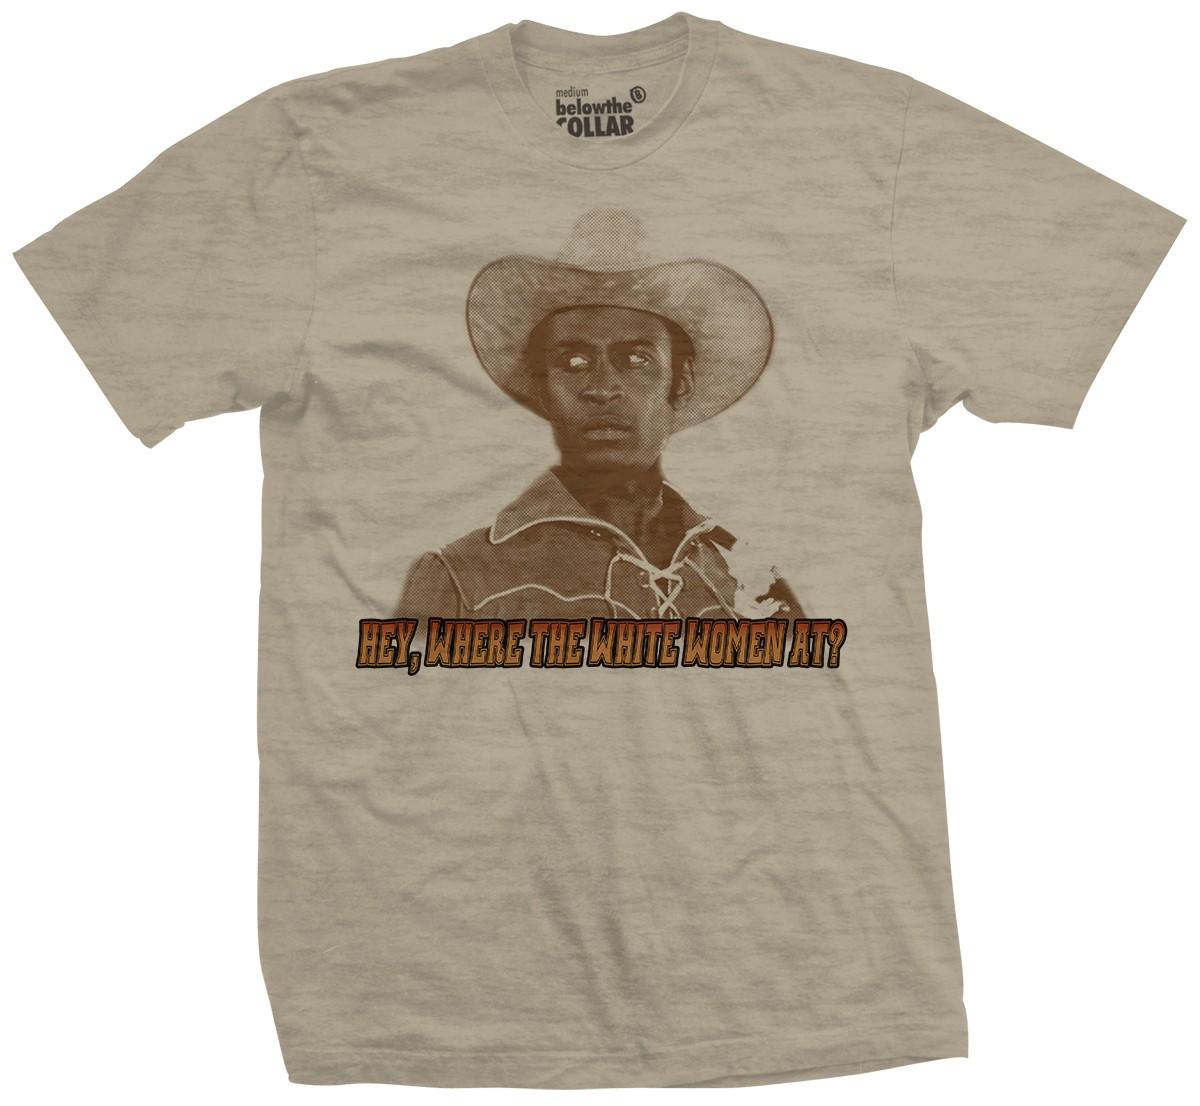 Sheriff Bart Blazing Saddles T-Shirt - belowtheCollar.com